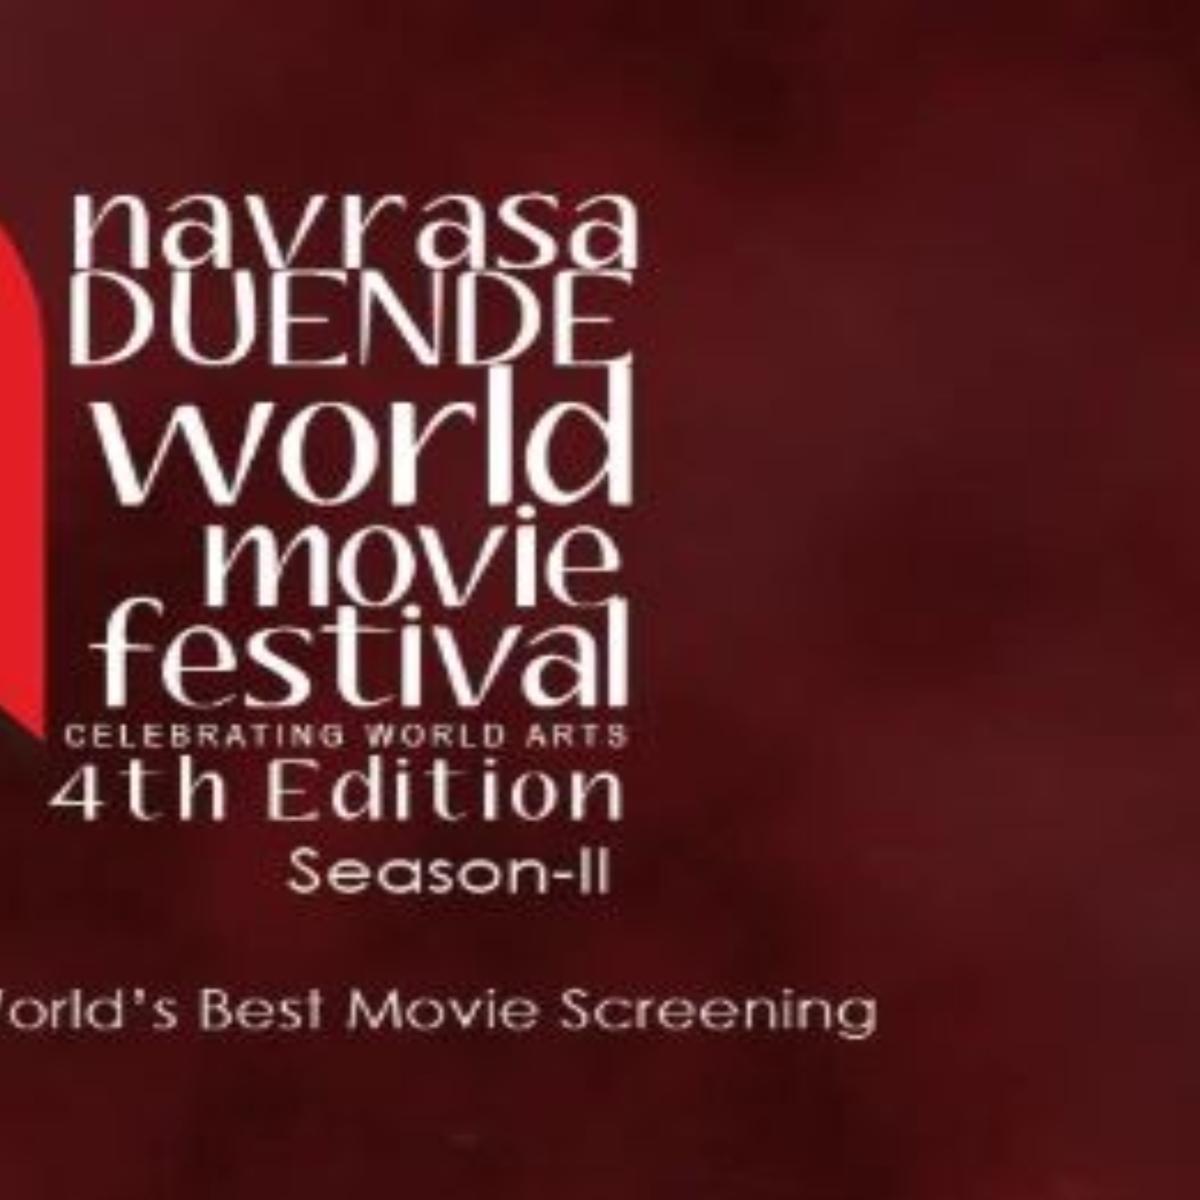 A sneak peek in the 4th Edition (Season II) of Navrasa Duende World Movie Festival